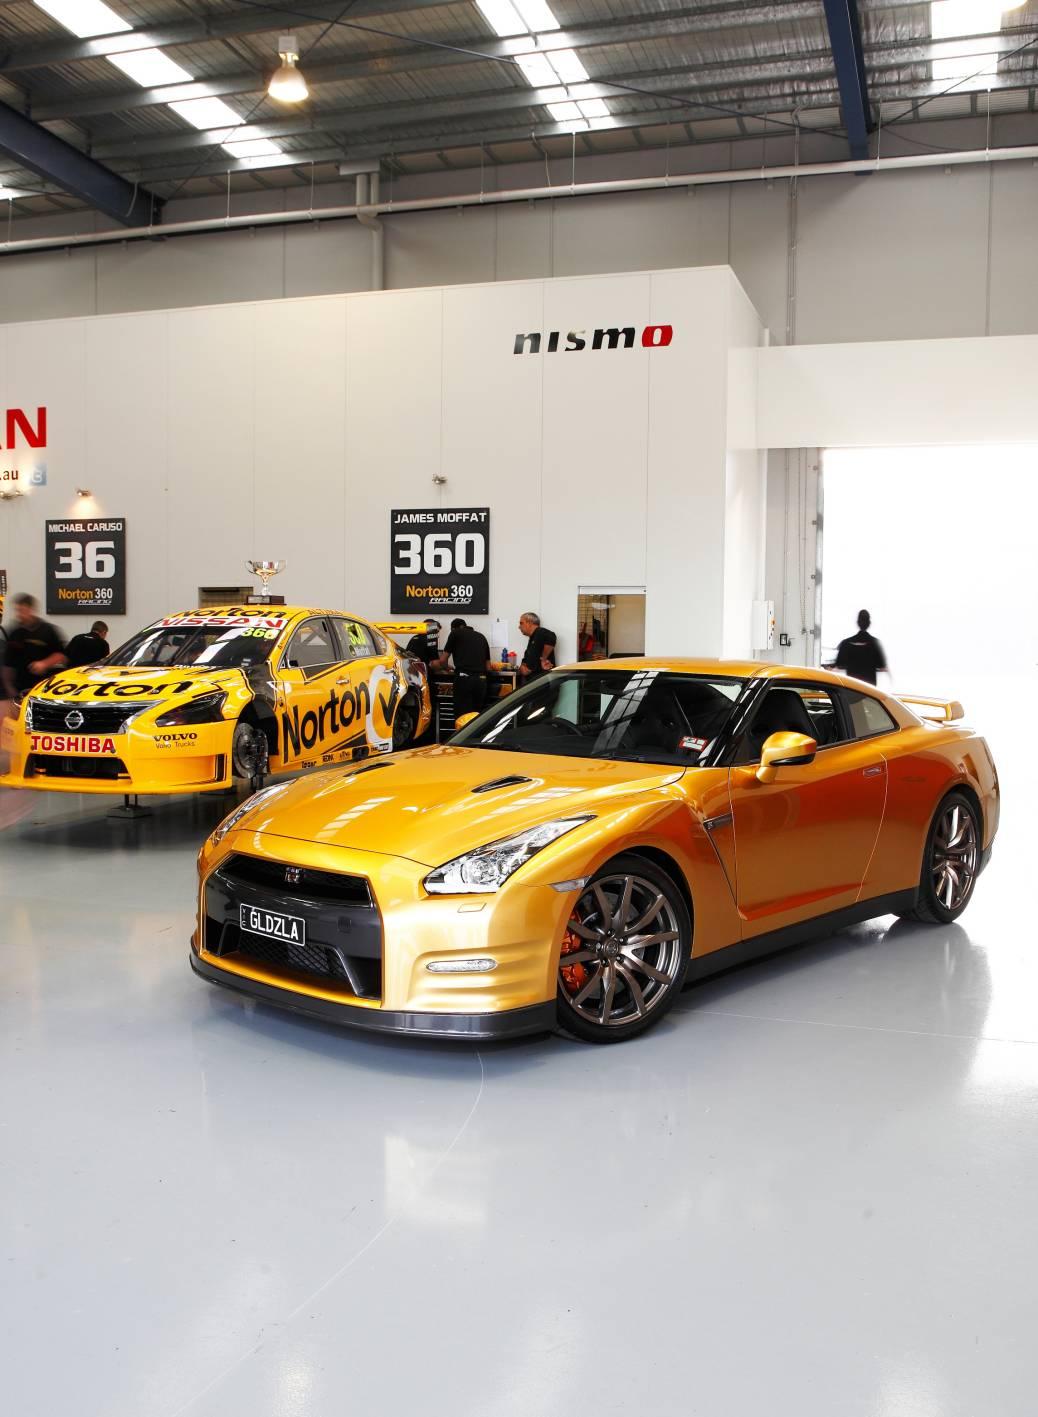 Nissan Gt R Black Supercar 4k Android Wallpaper: News: Gold GT-R 'Usain Bolt Edition